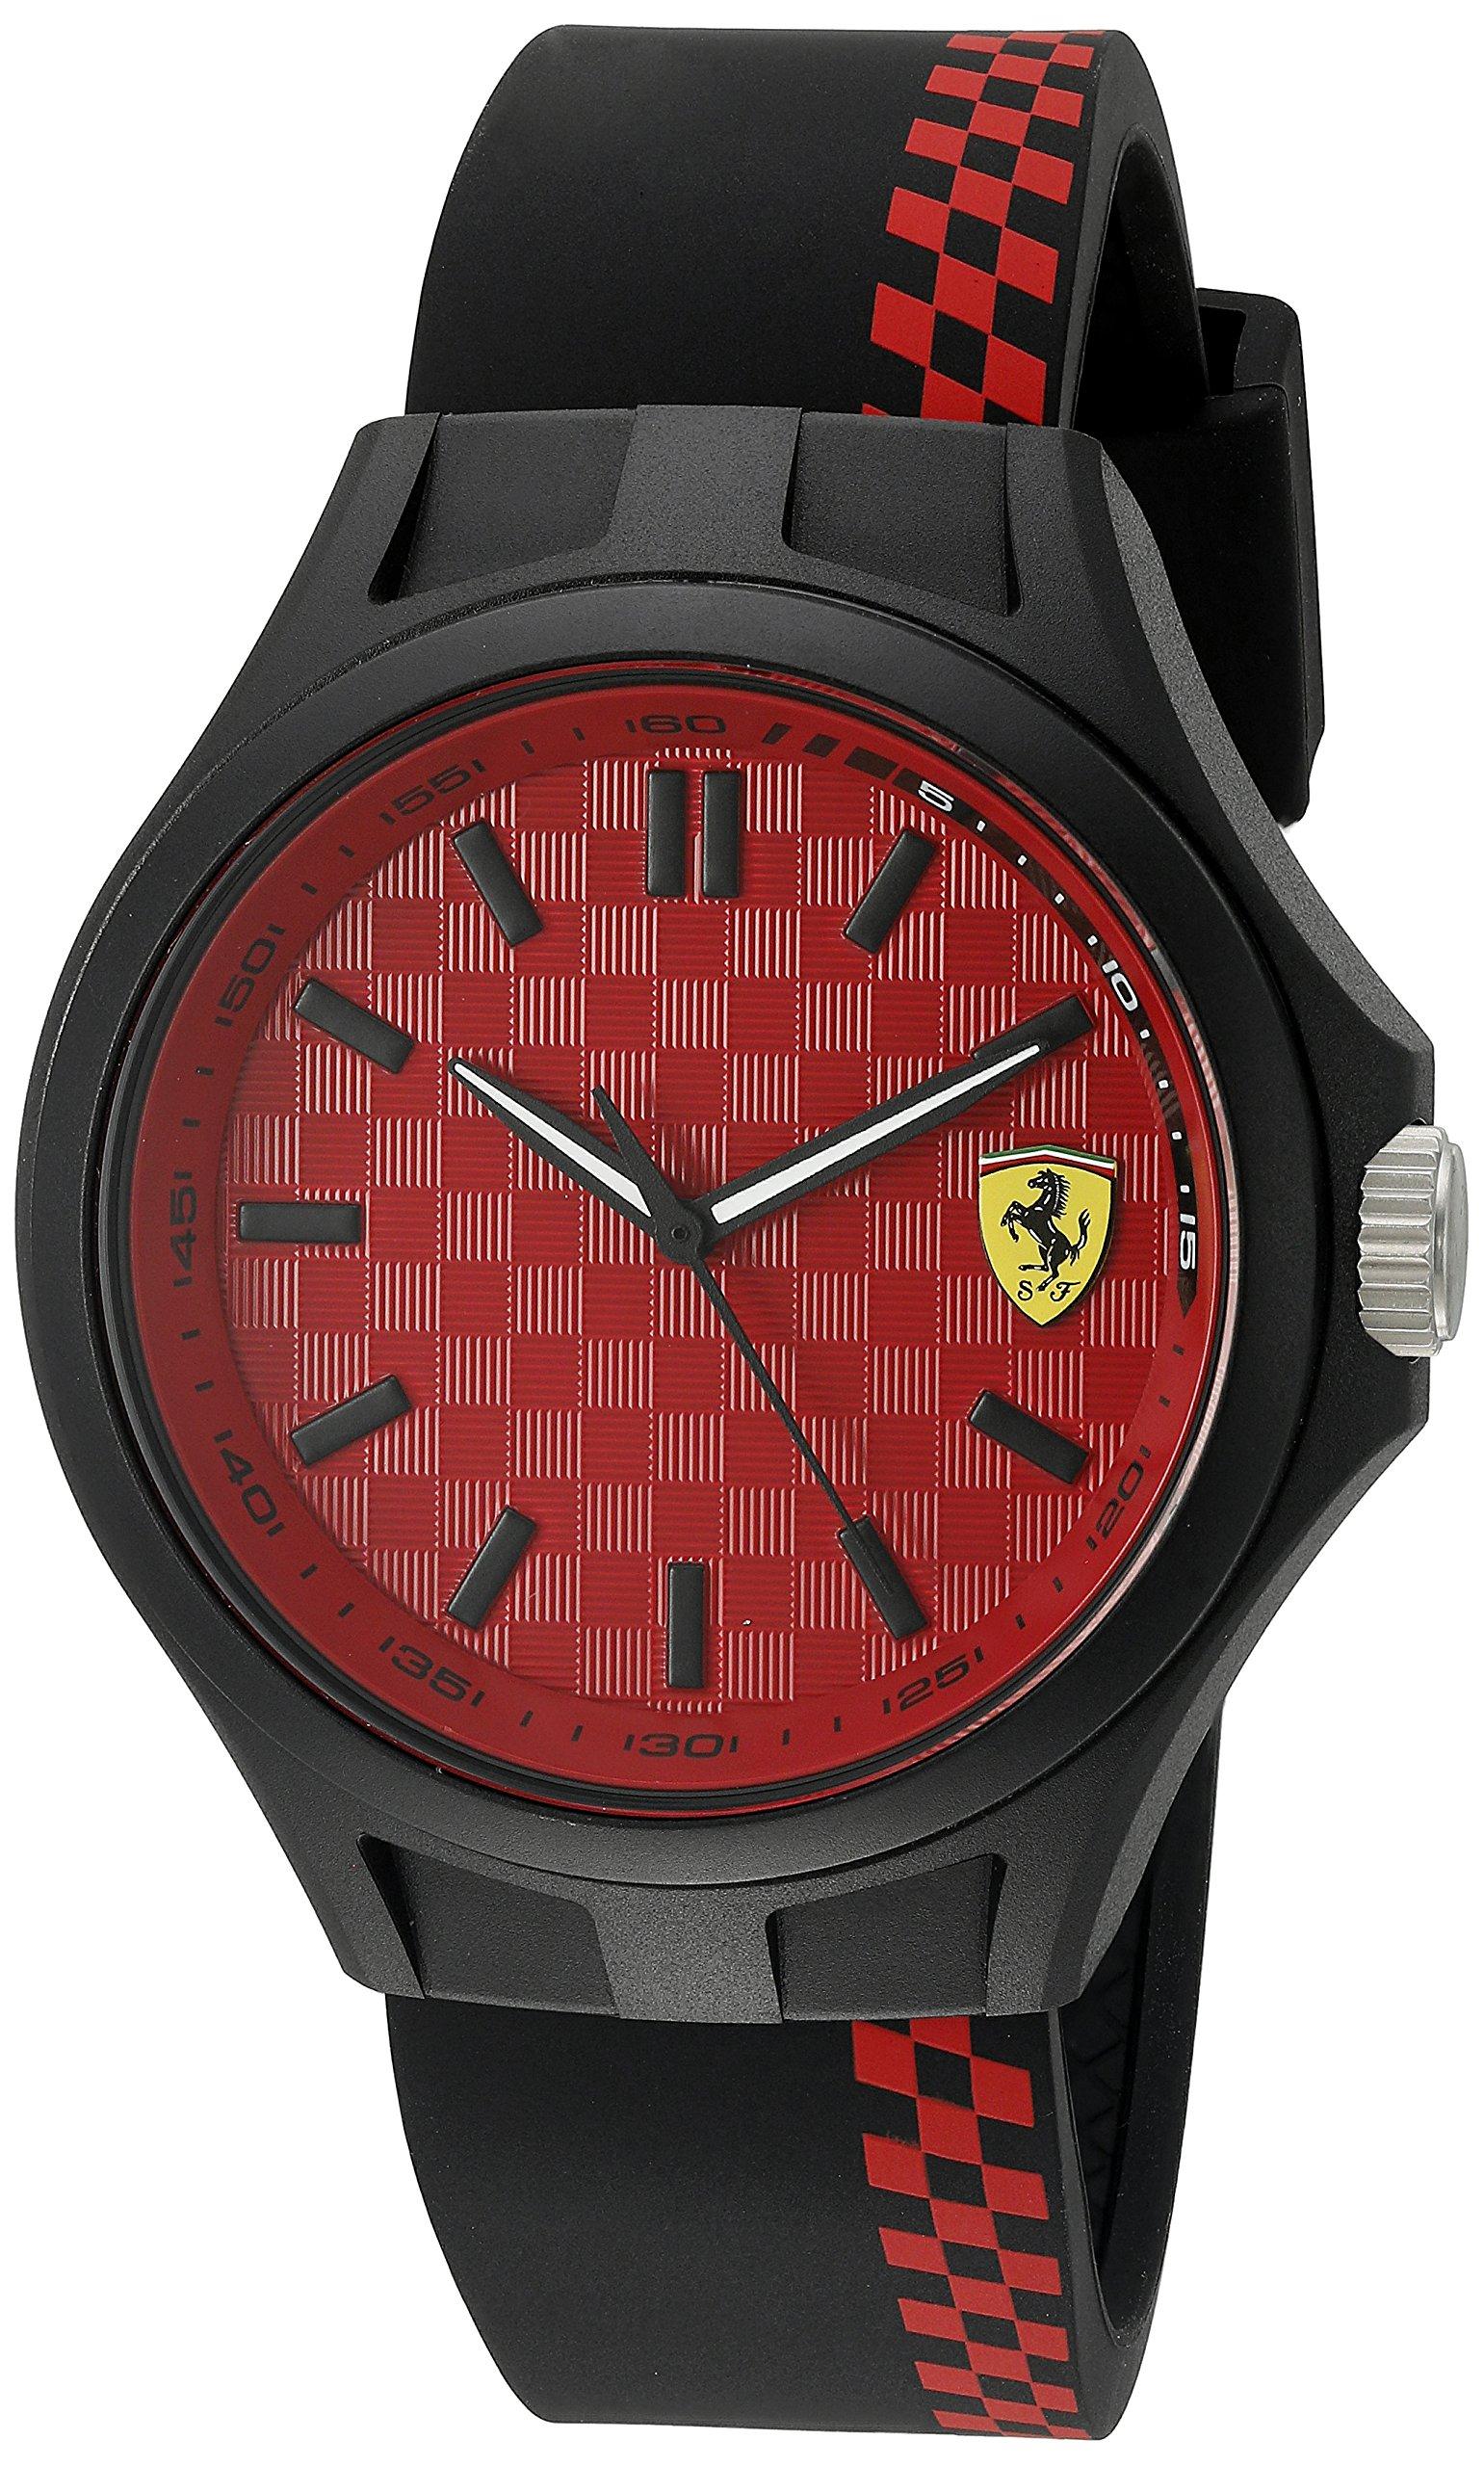 Ferrari Men's Quartz Multi Color Casual Watch (Model: 0830325), Black/Red